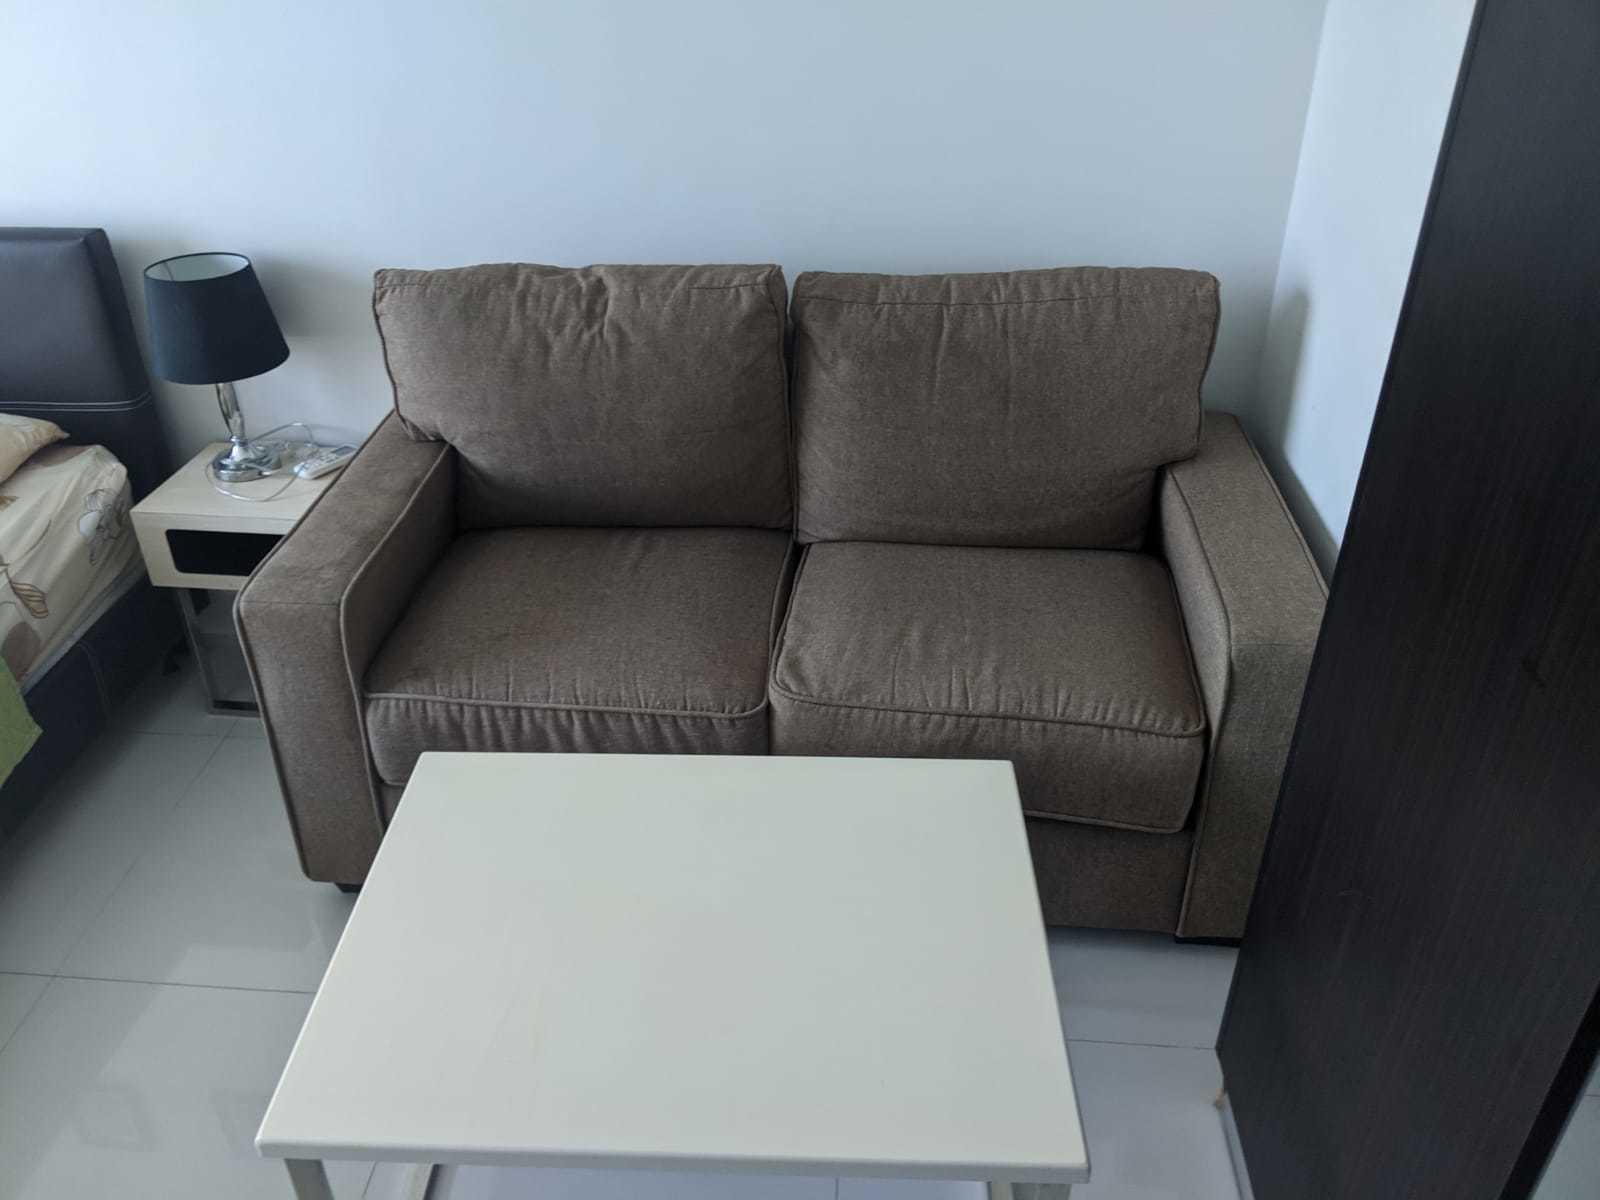 Квартира - студия в Club Royal, северная Паттайя